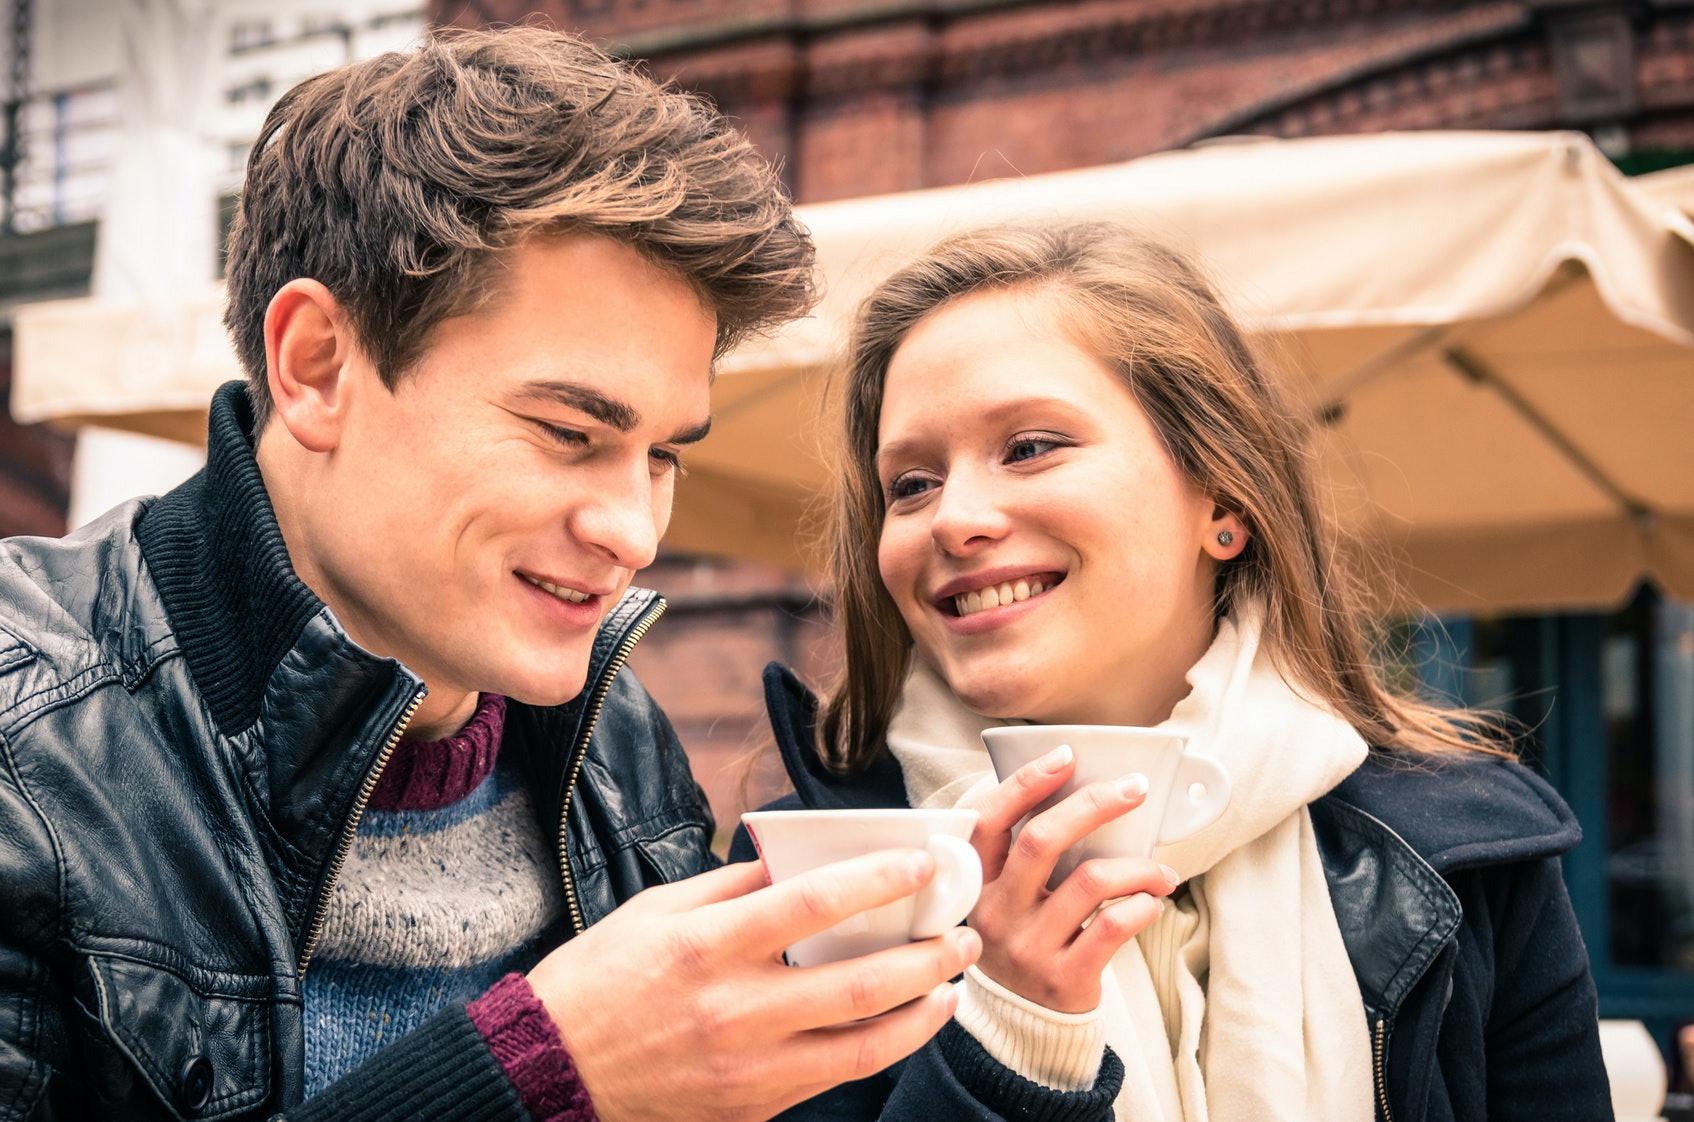 Speed dating events in birmingham uk